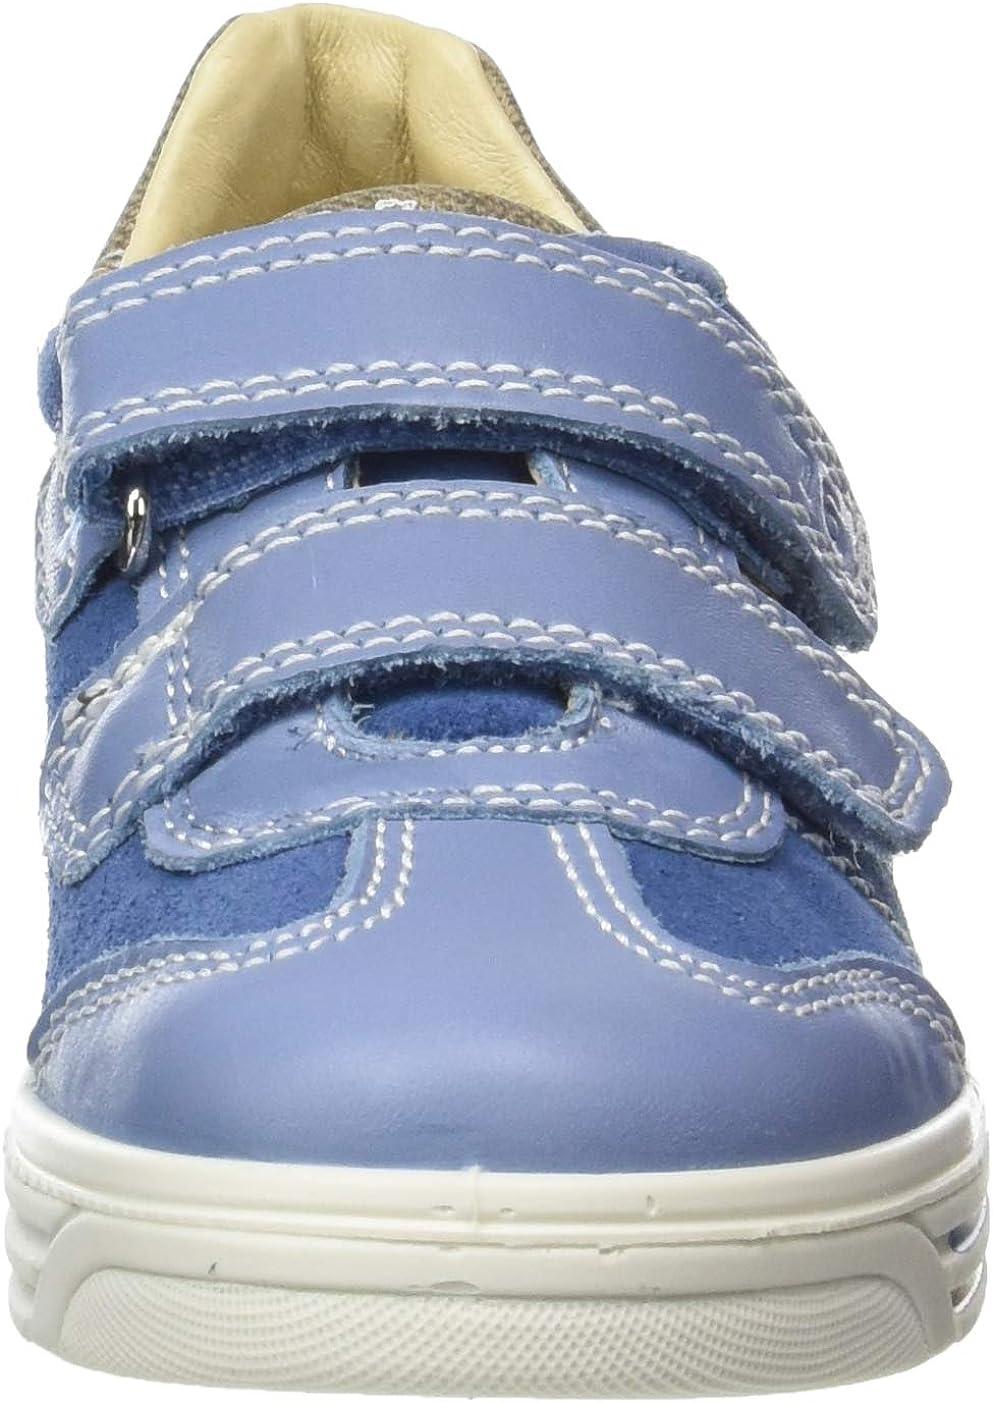 Primigi Boys/' PHU 33831 Low-Top Sneakers